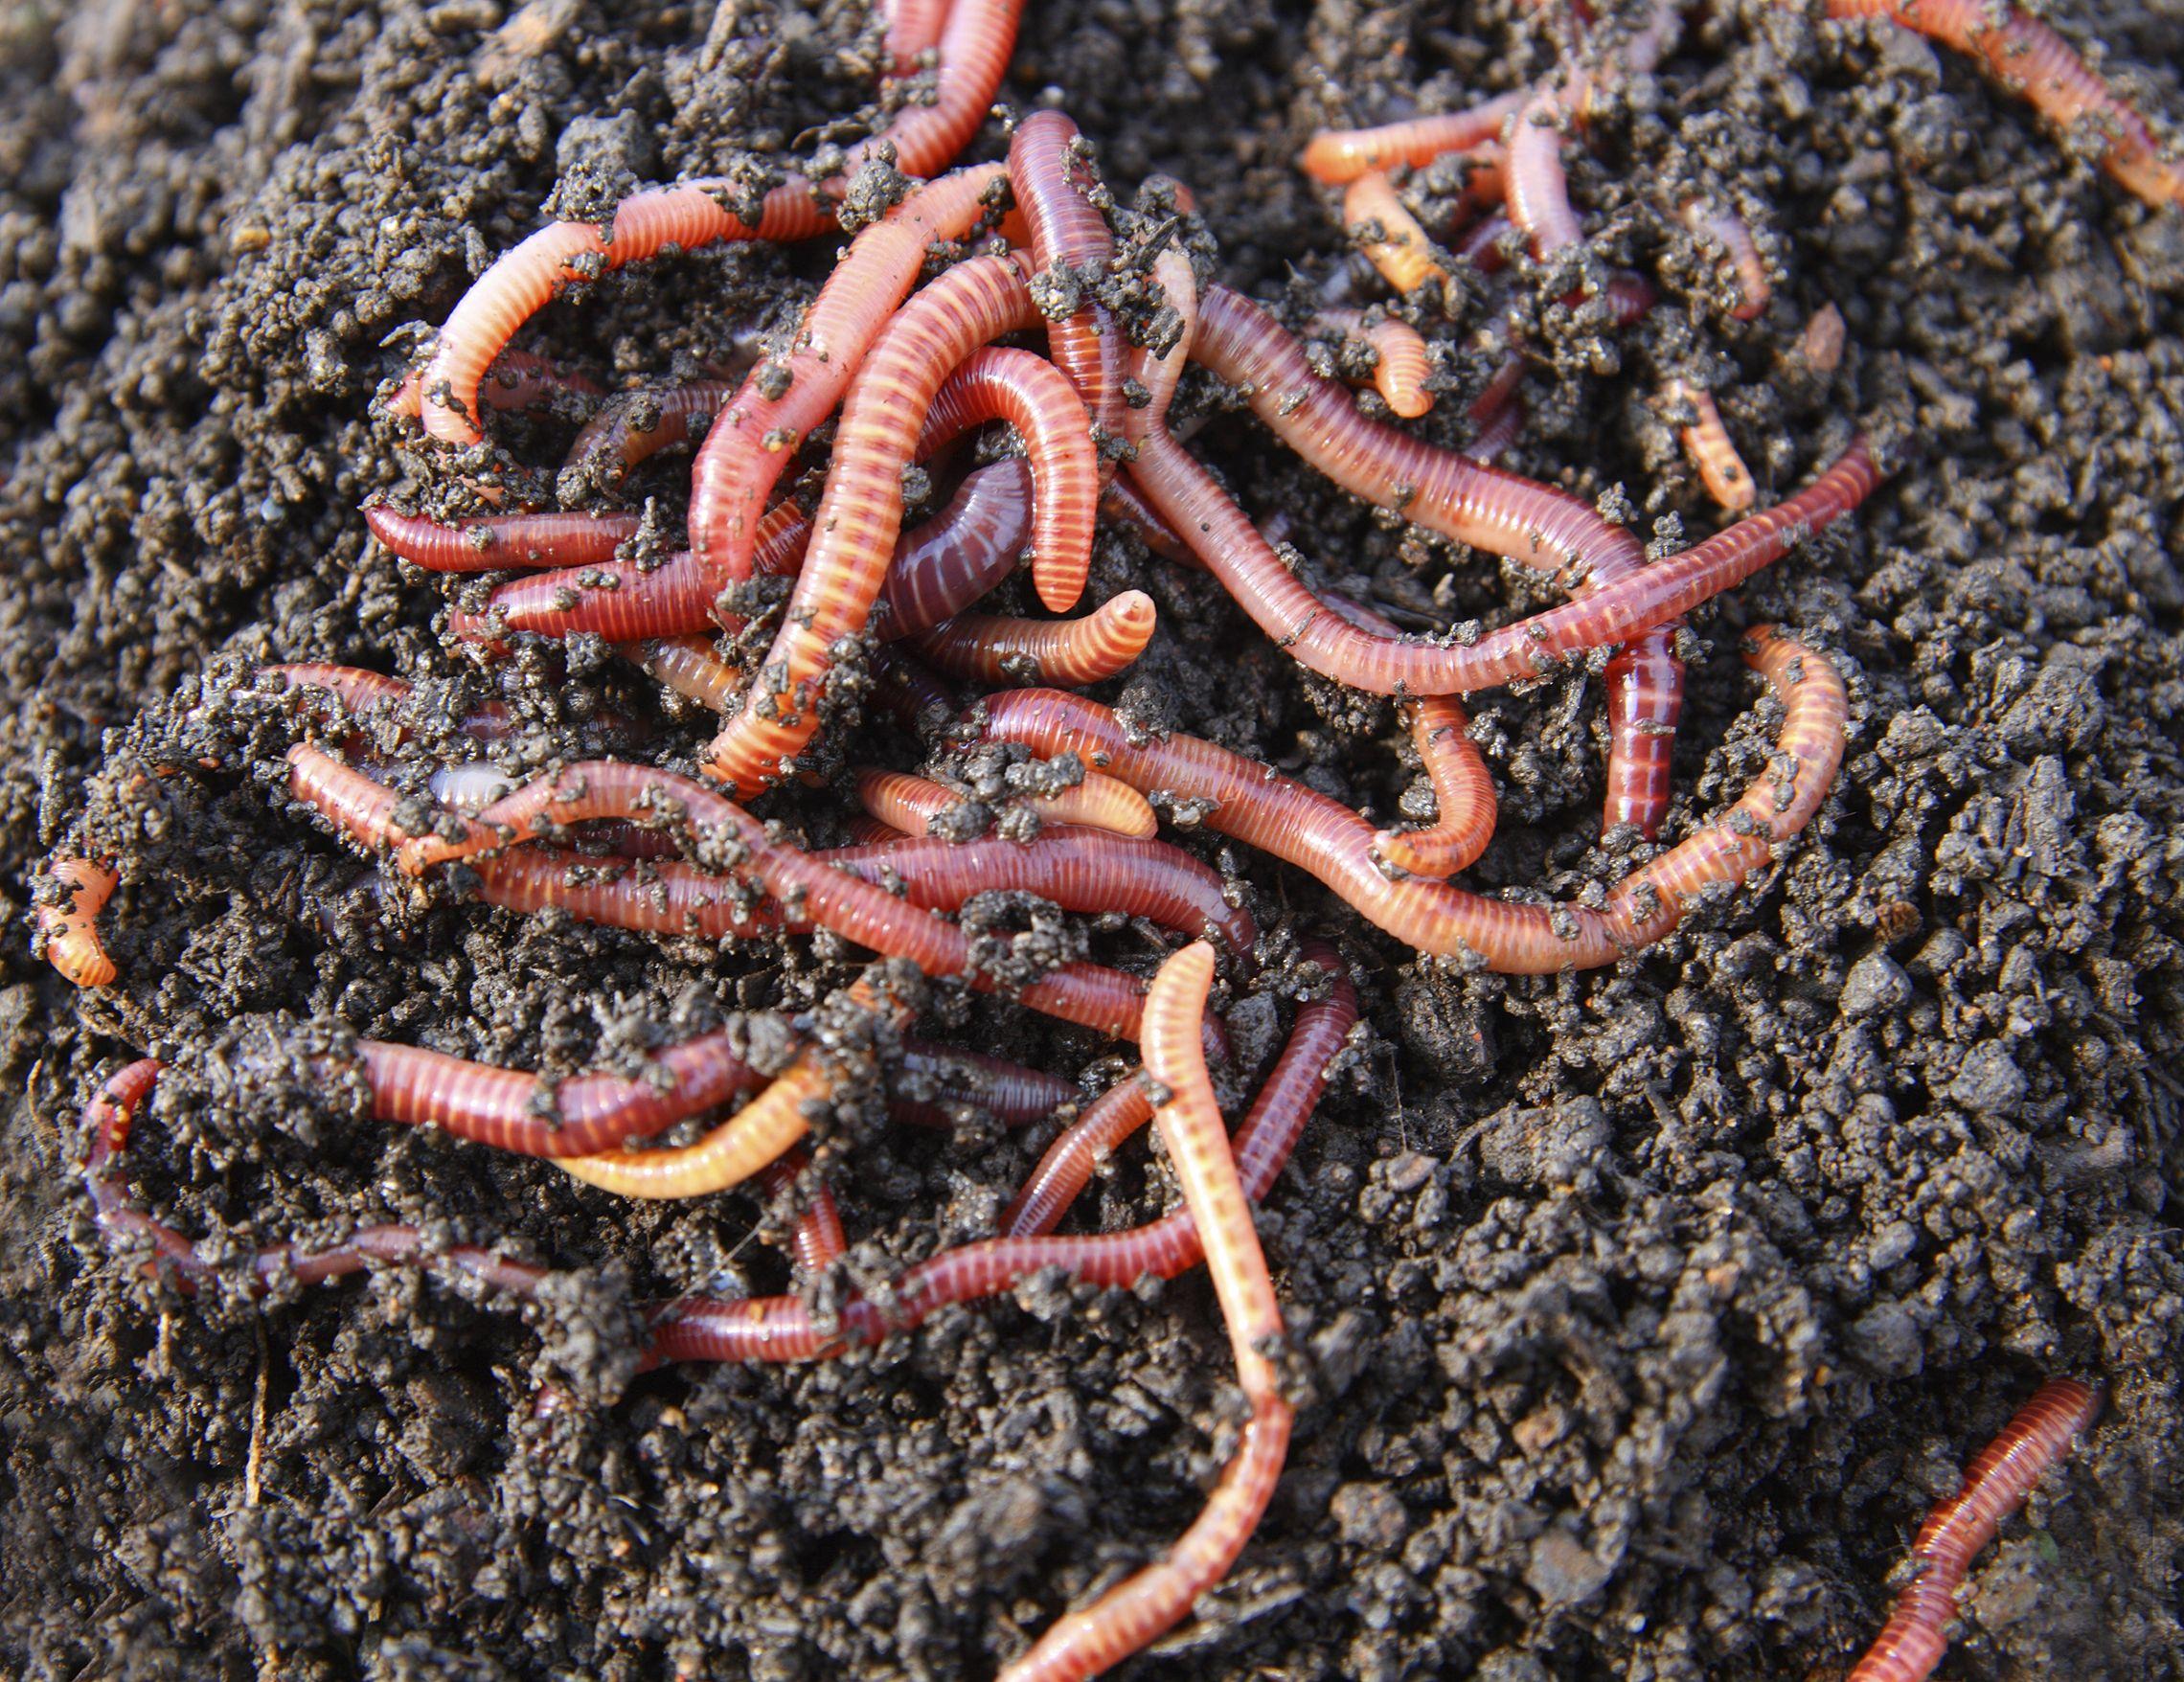 How To Compost, Worm Composting, Worm Farm, Earthworms, Urban Farming,  Organic Gardening, Organic Compost, Vegetable Garden, Garden Soil